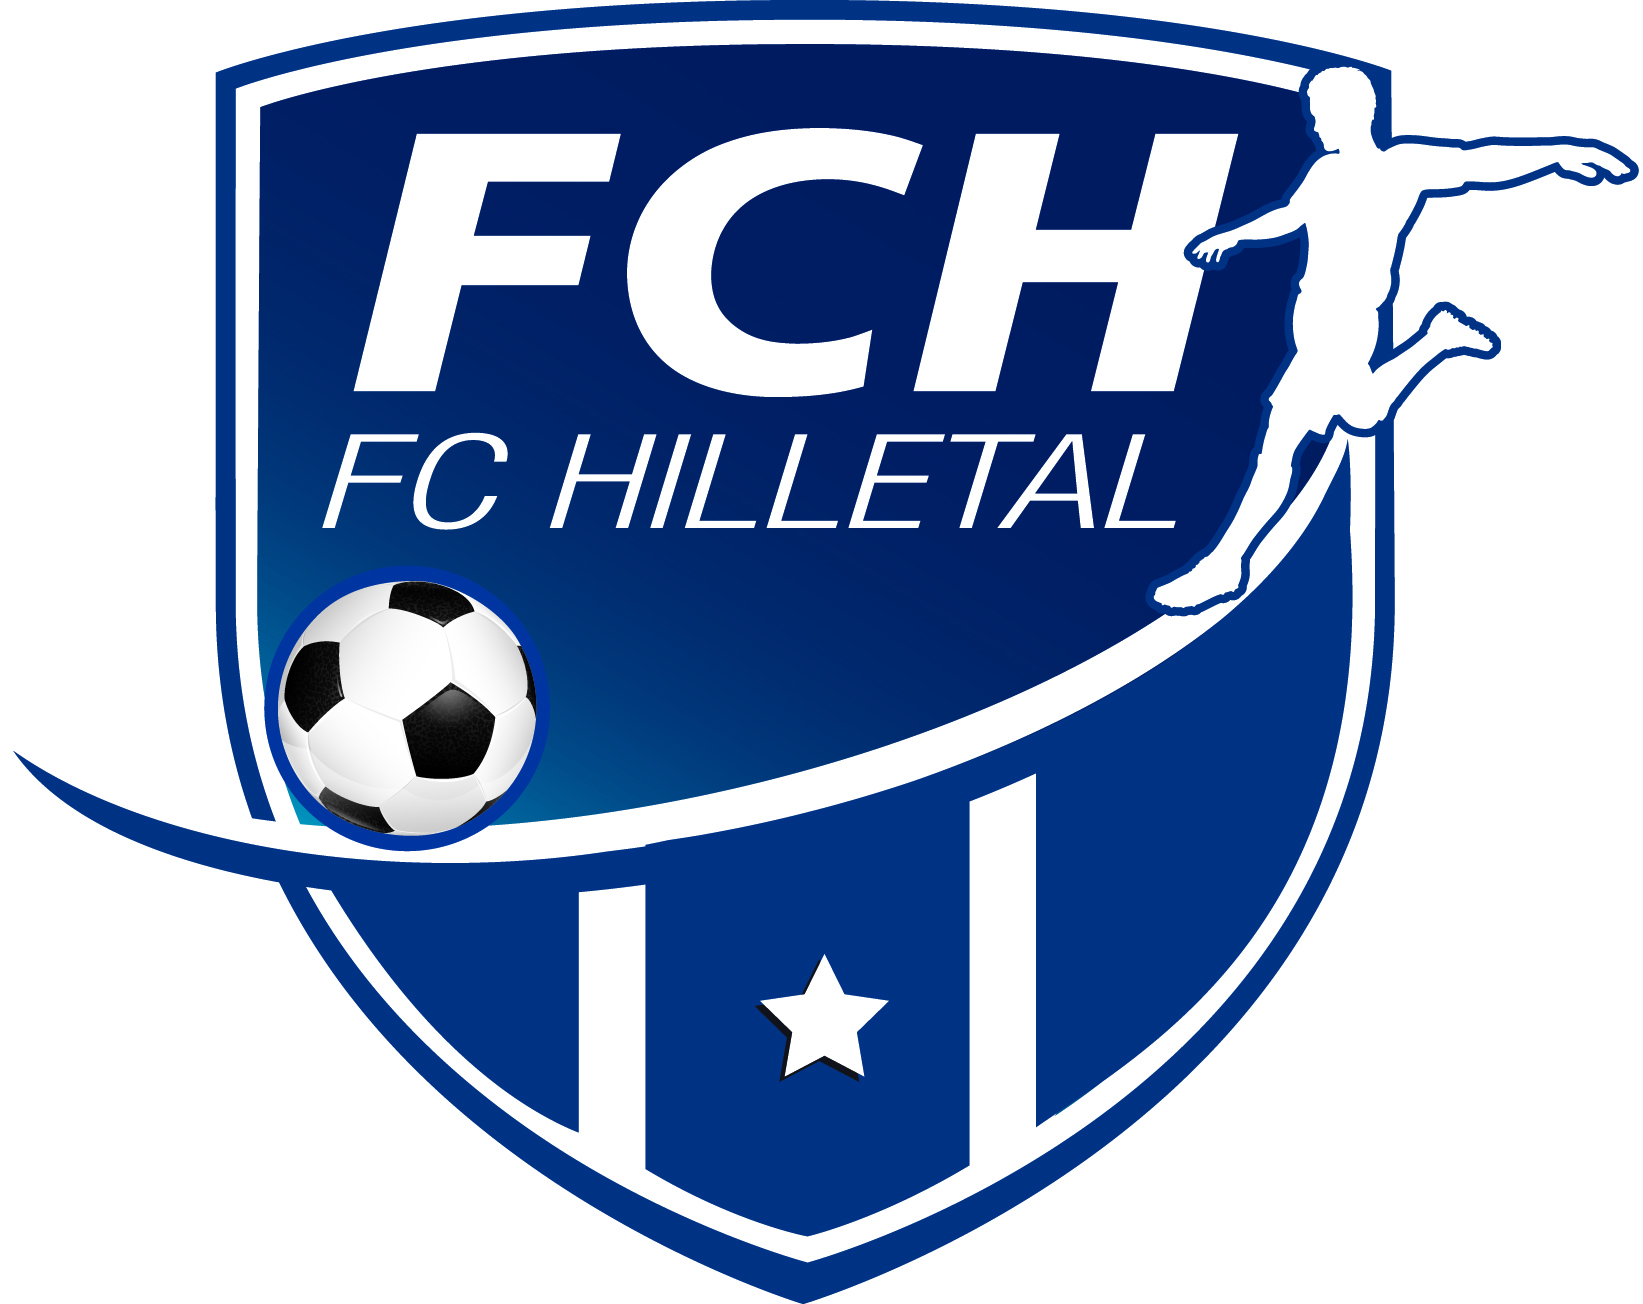 Fussball Vereins Logo Erstellen Logo Design Designonclick Com